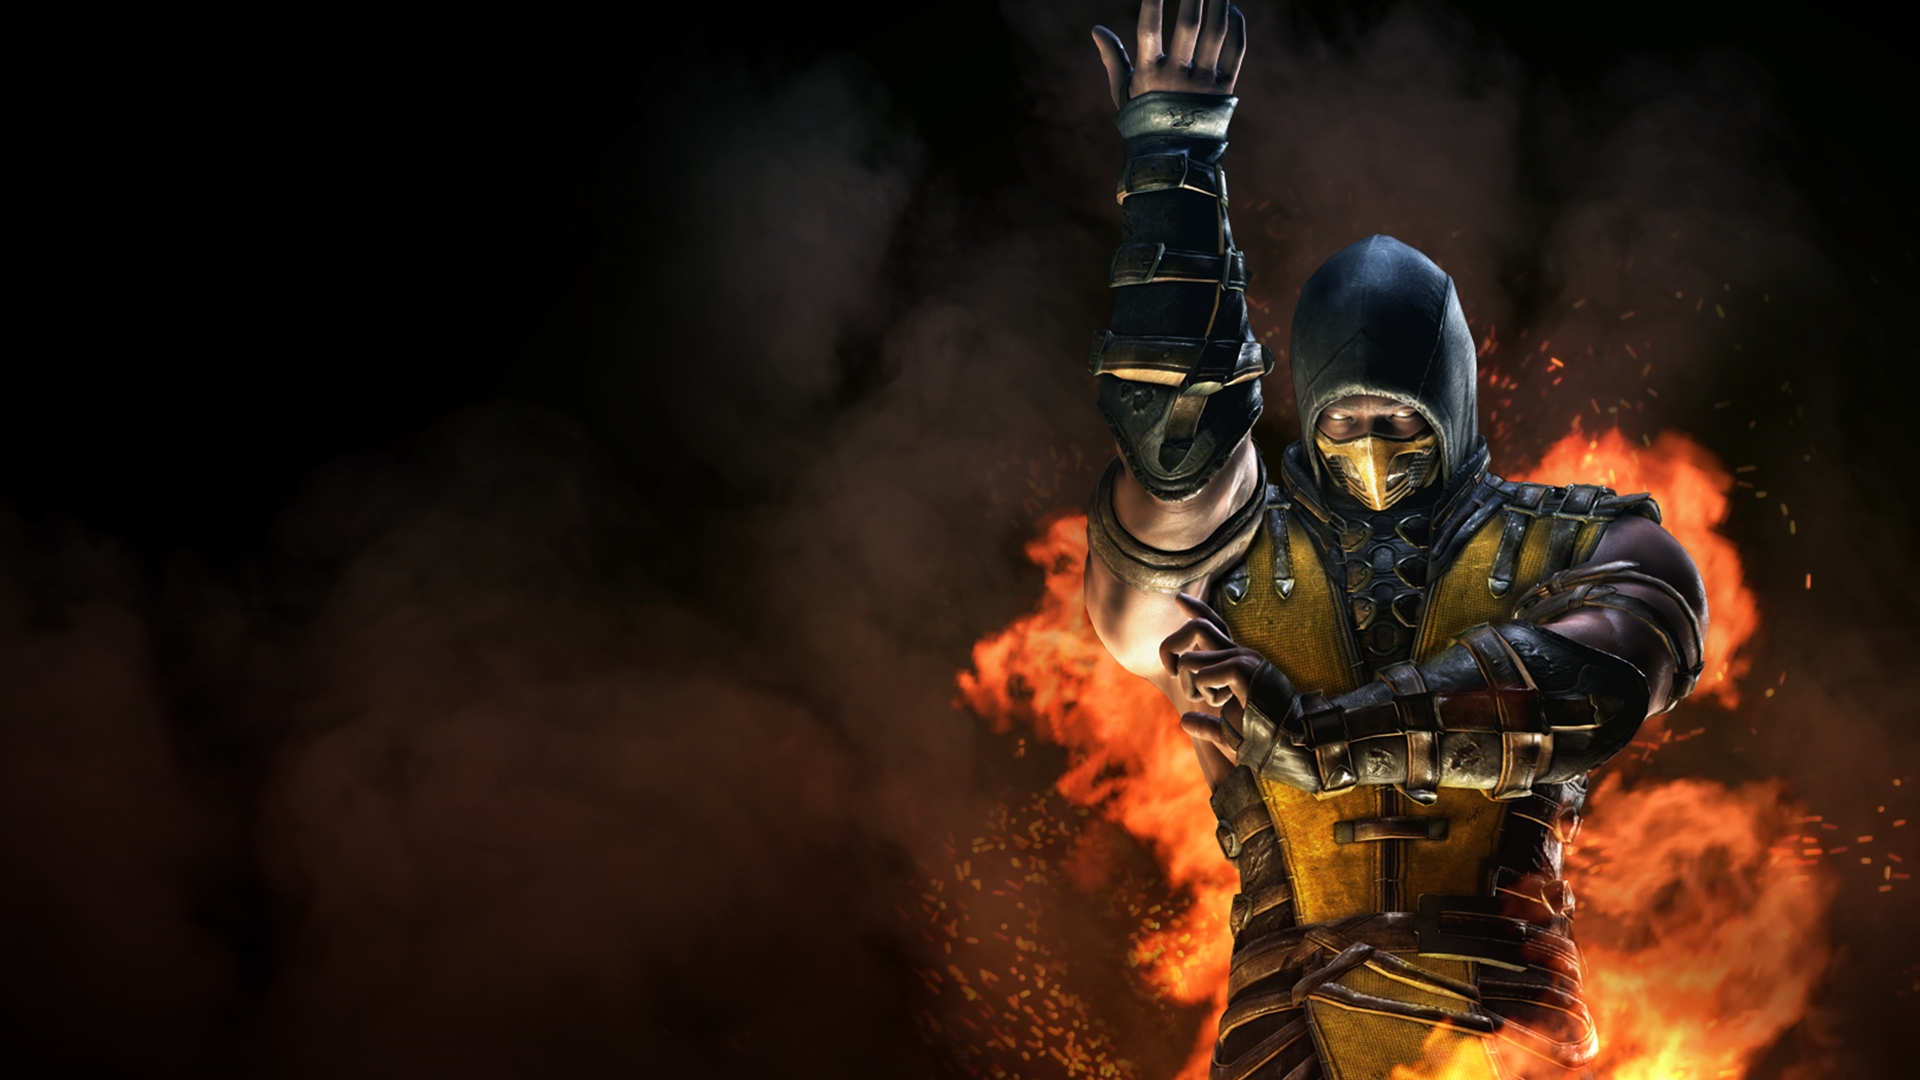 Mortal Kombat Scorpion Wallpaper 1920x1080